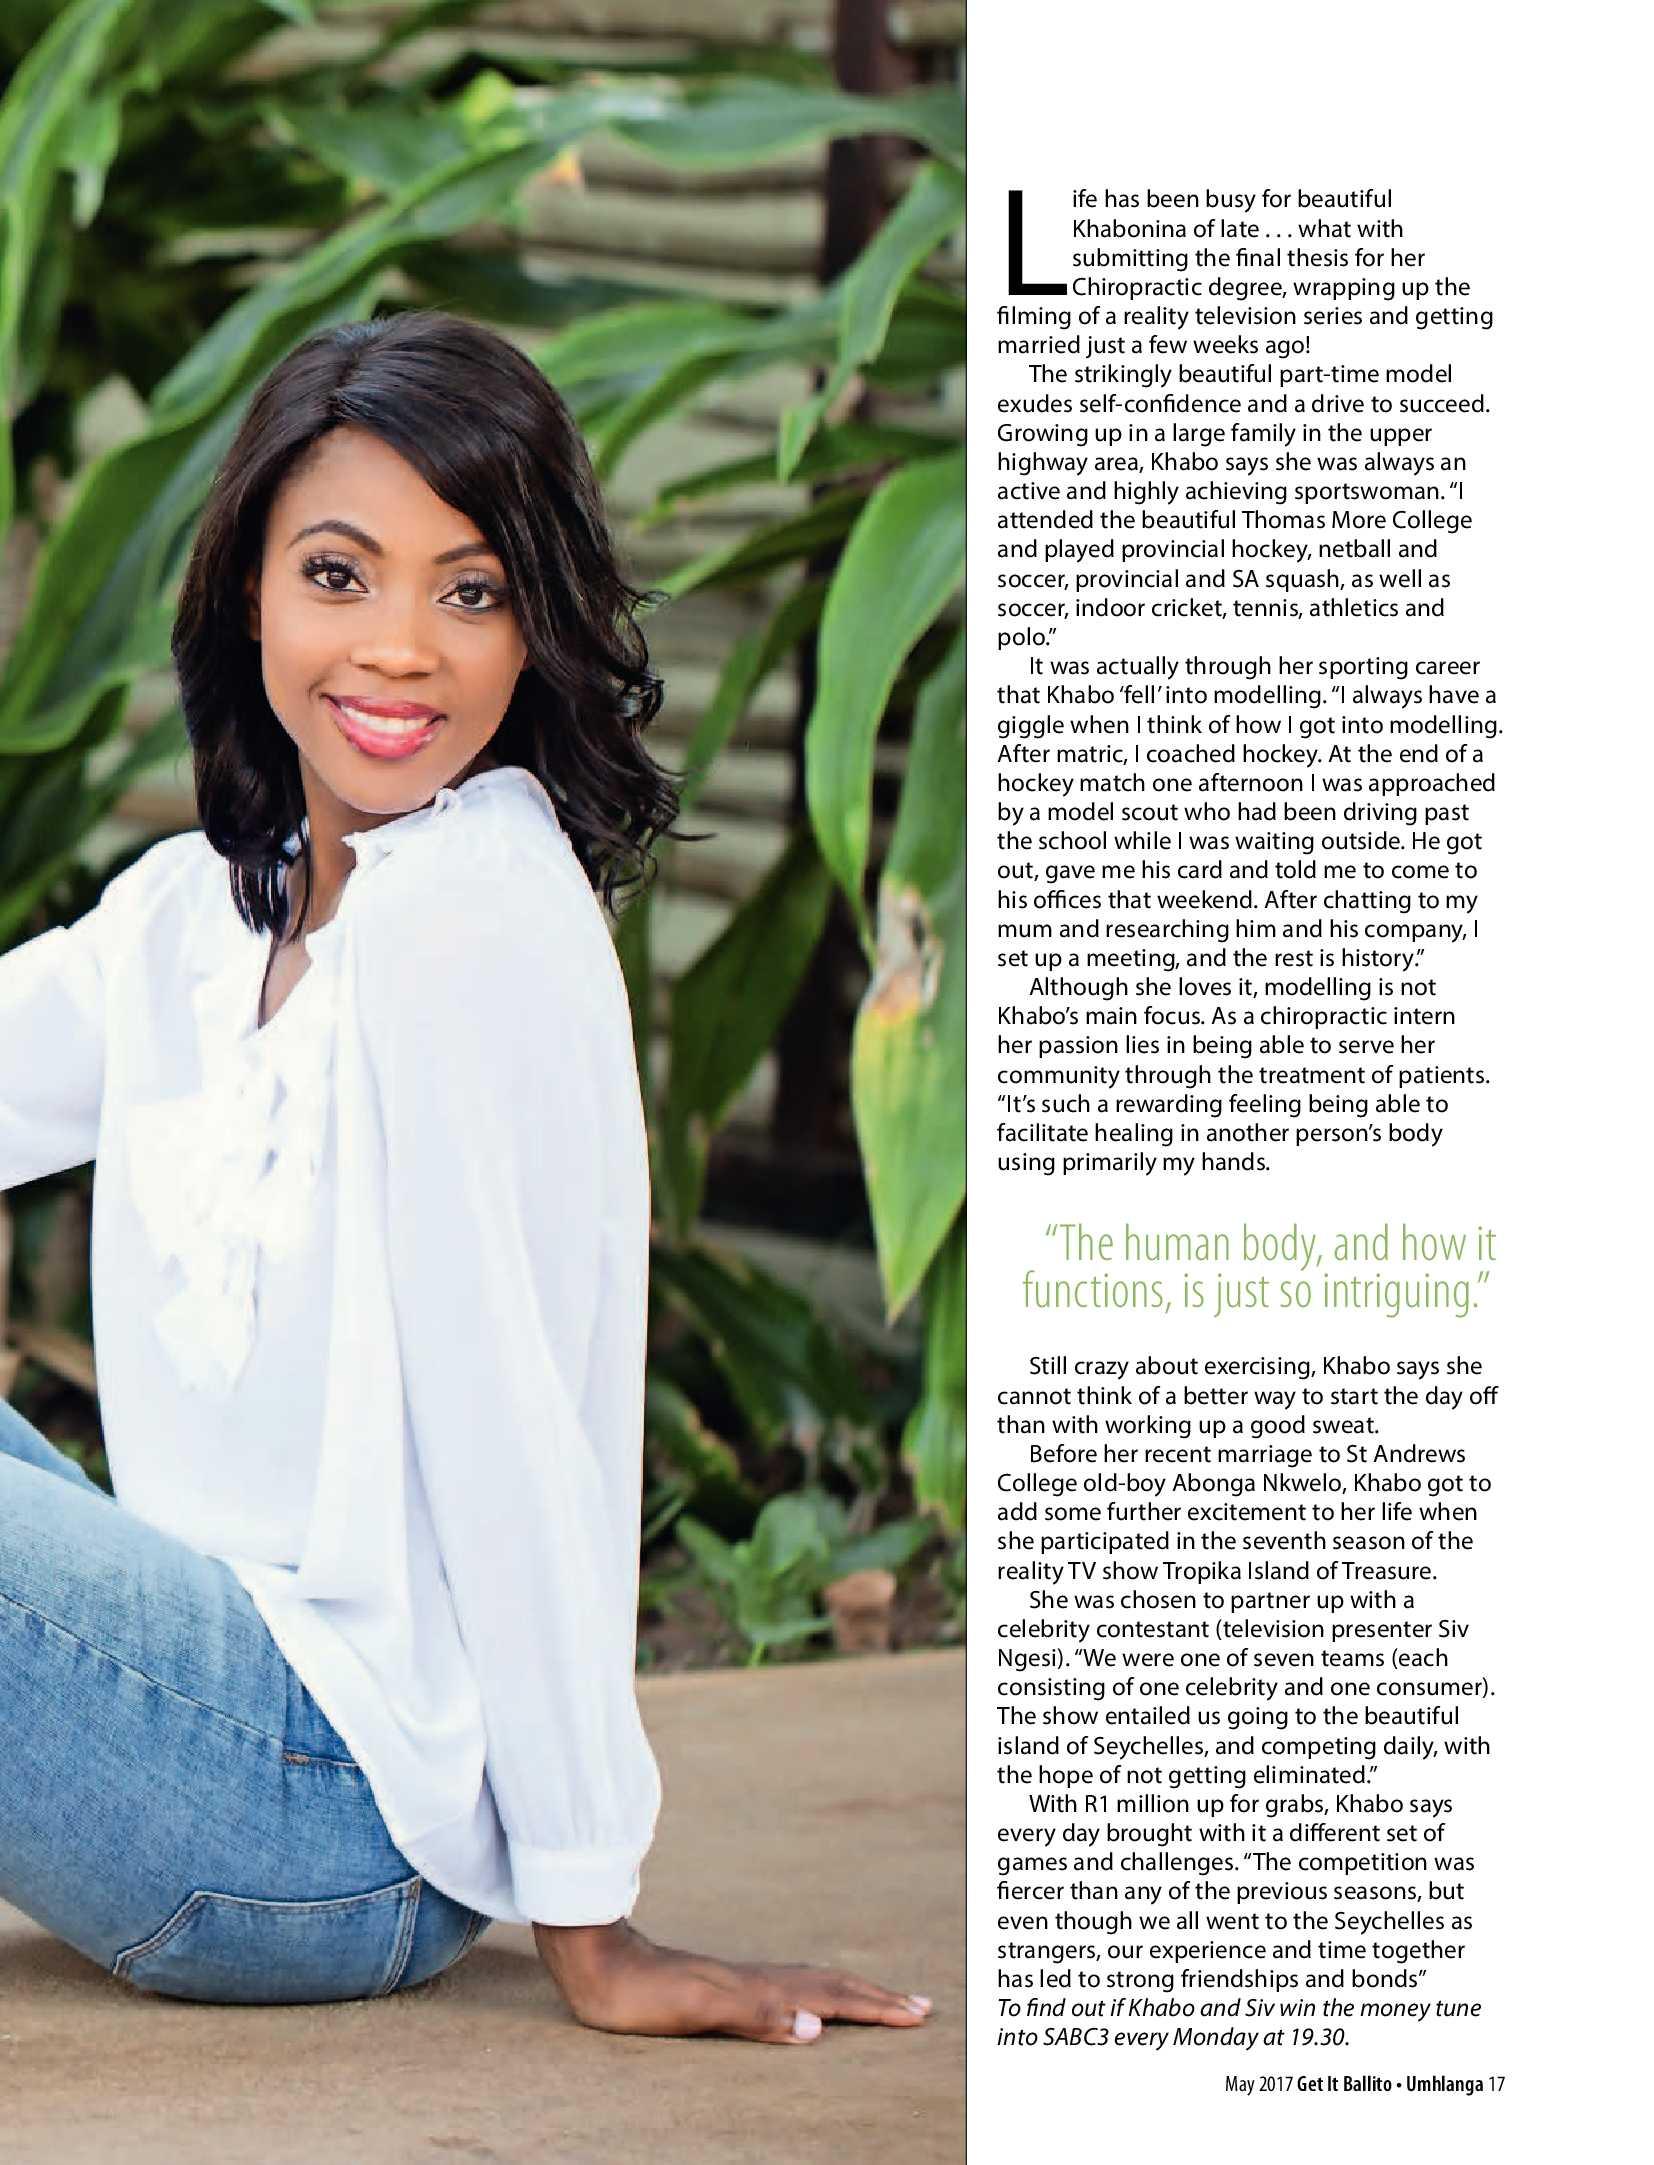 get-magazine-ballitoumhlanga-may-2017-epapers-page-19